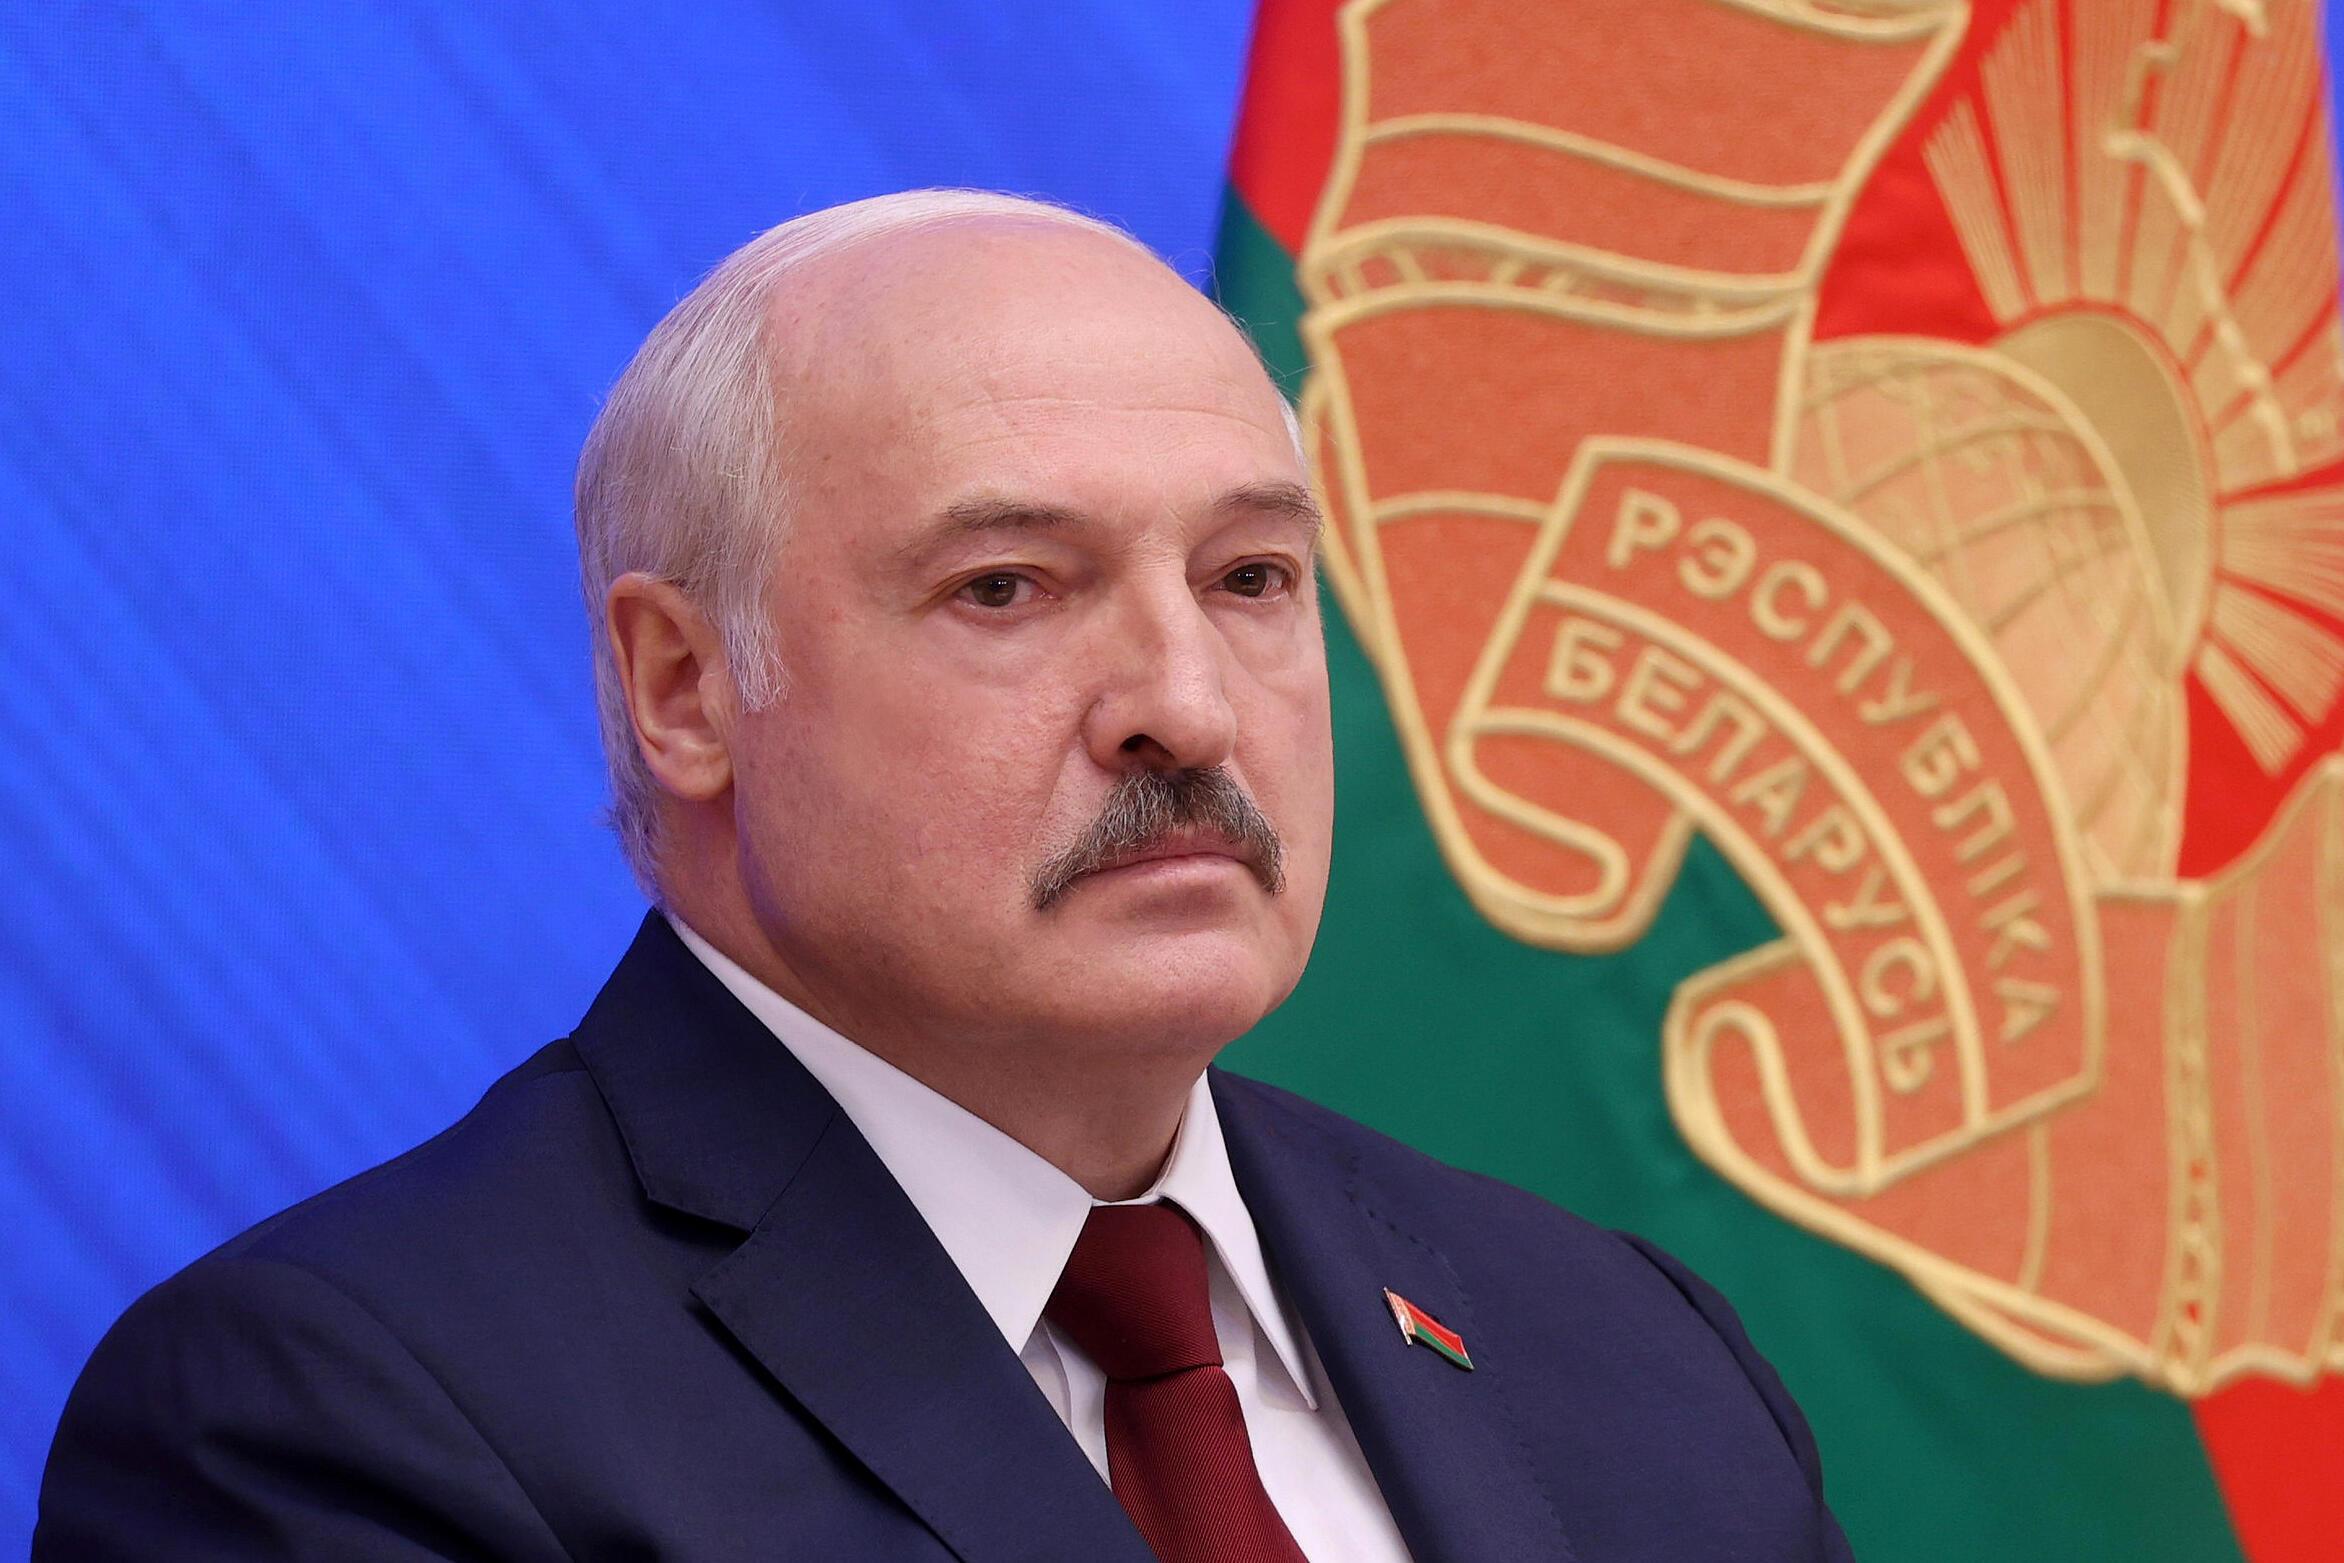 The regime of Belarus' President Alexander Lukashenko faces fresh US sanctions